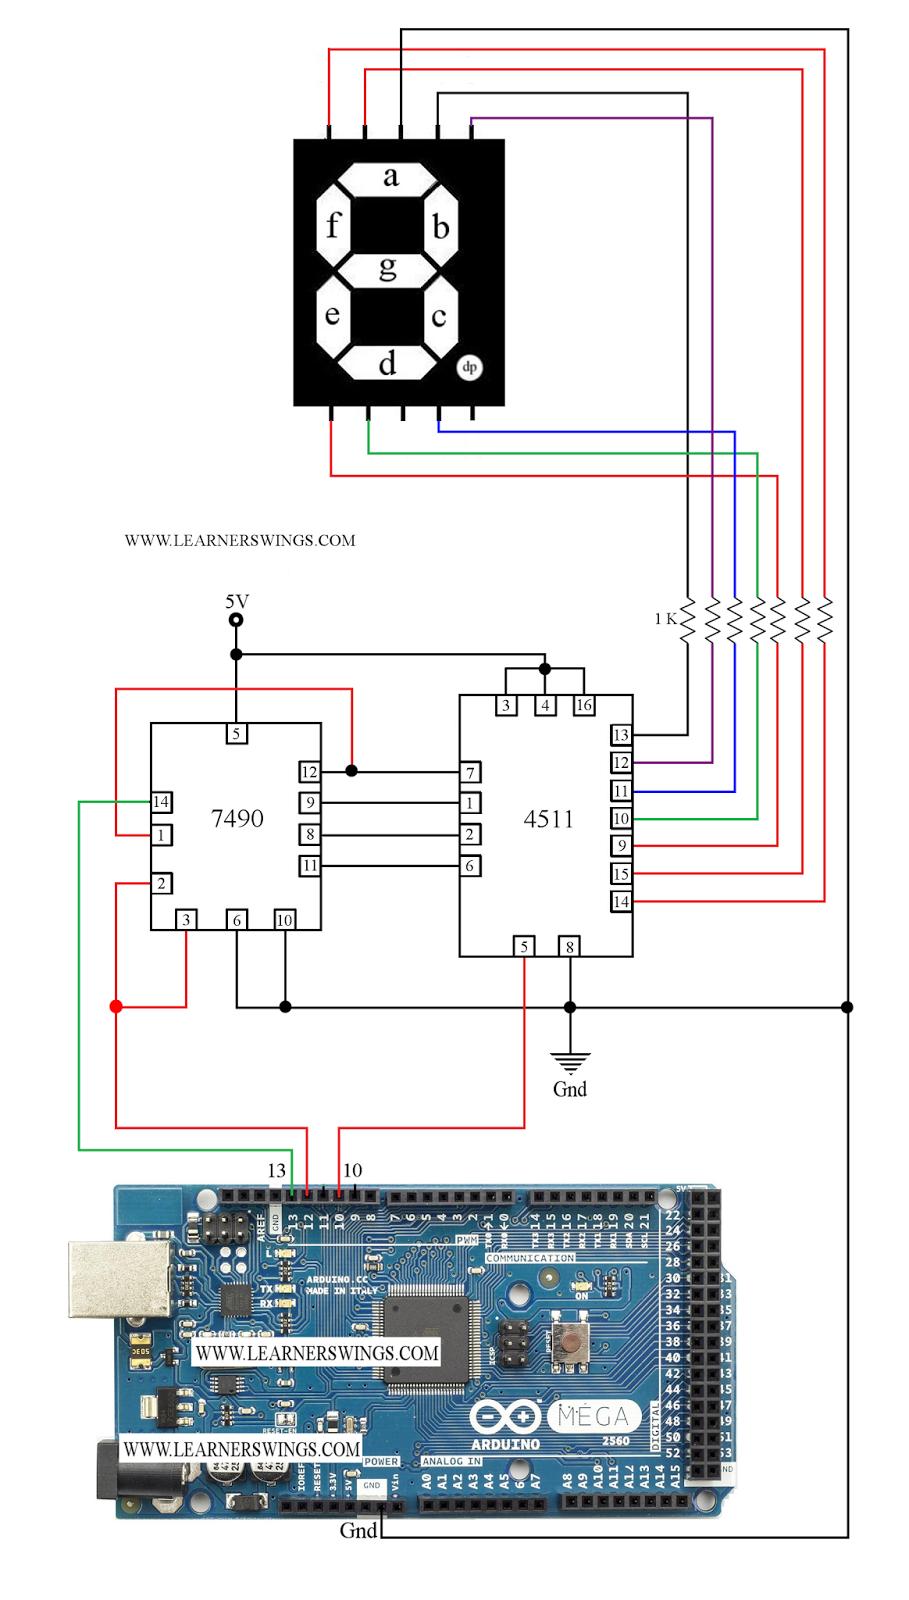 Pin De Febin Antony En My Funny Electronics Pinterest Arduino 555 Digital Temperature Sensor Header Circuit 555circuit Projects Y